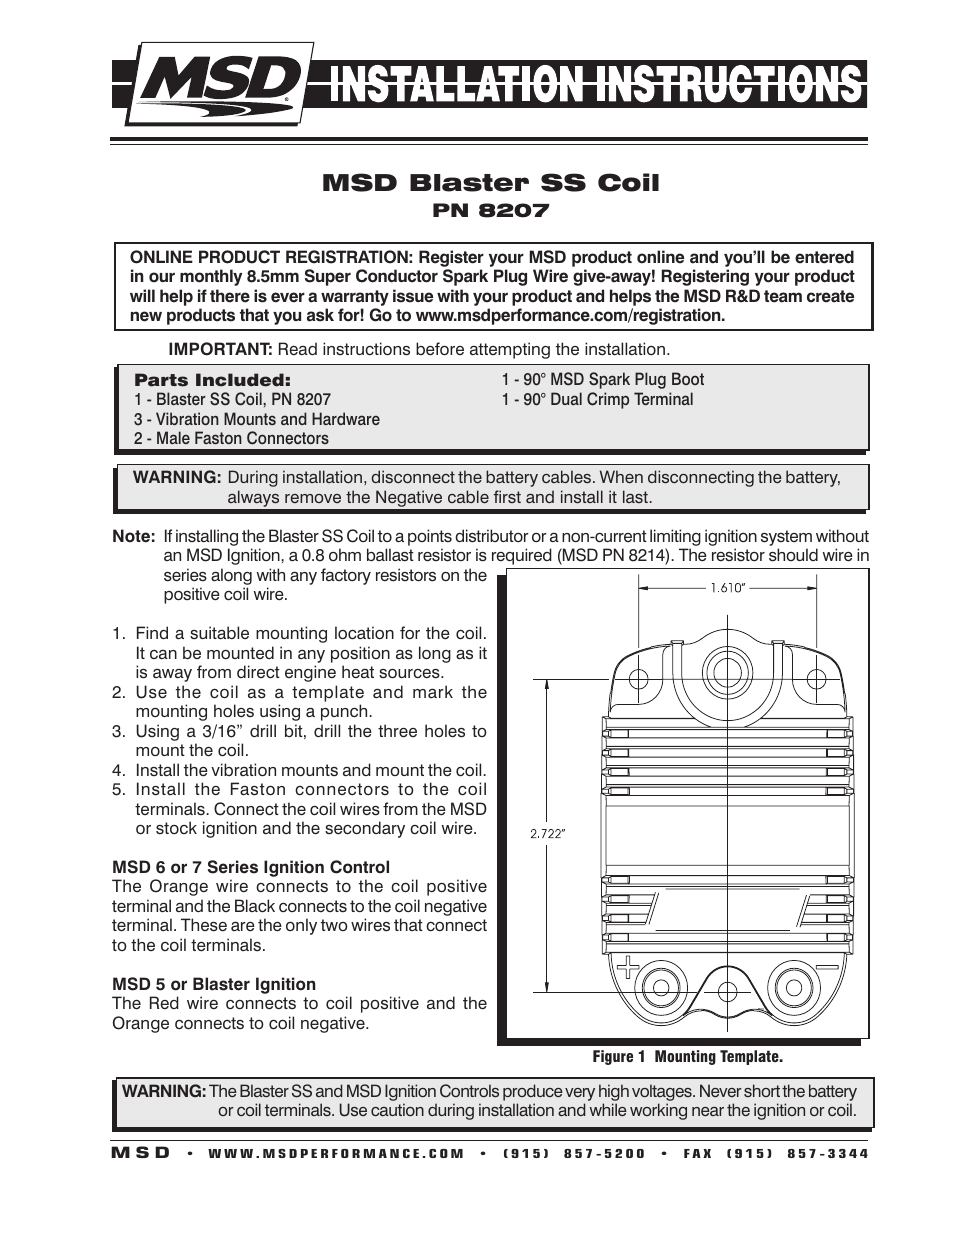 Msd Coil Wiring Diagram : Msd wiring diagram coil installation